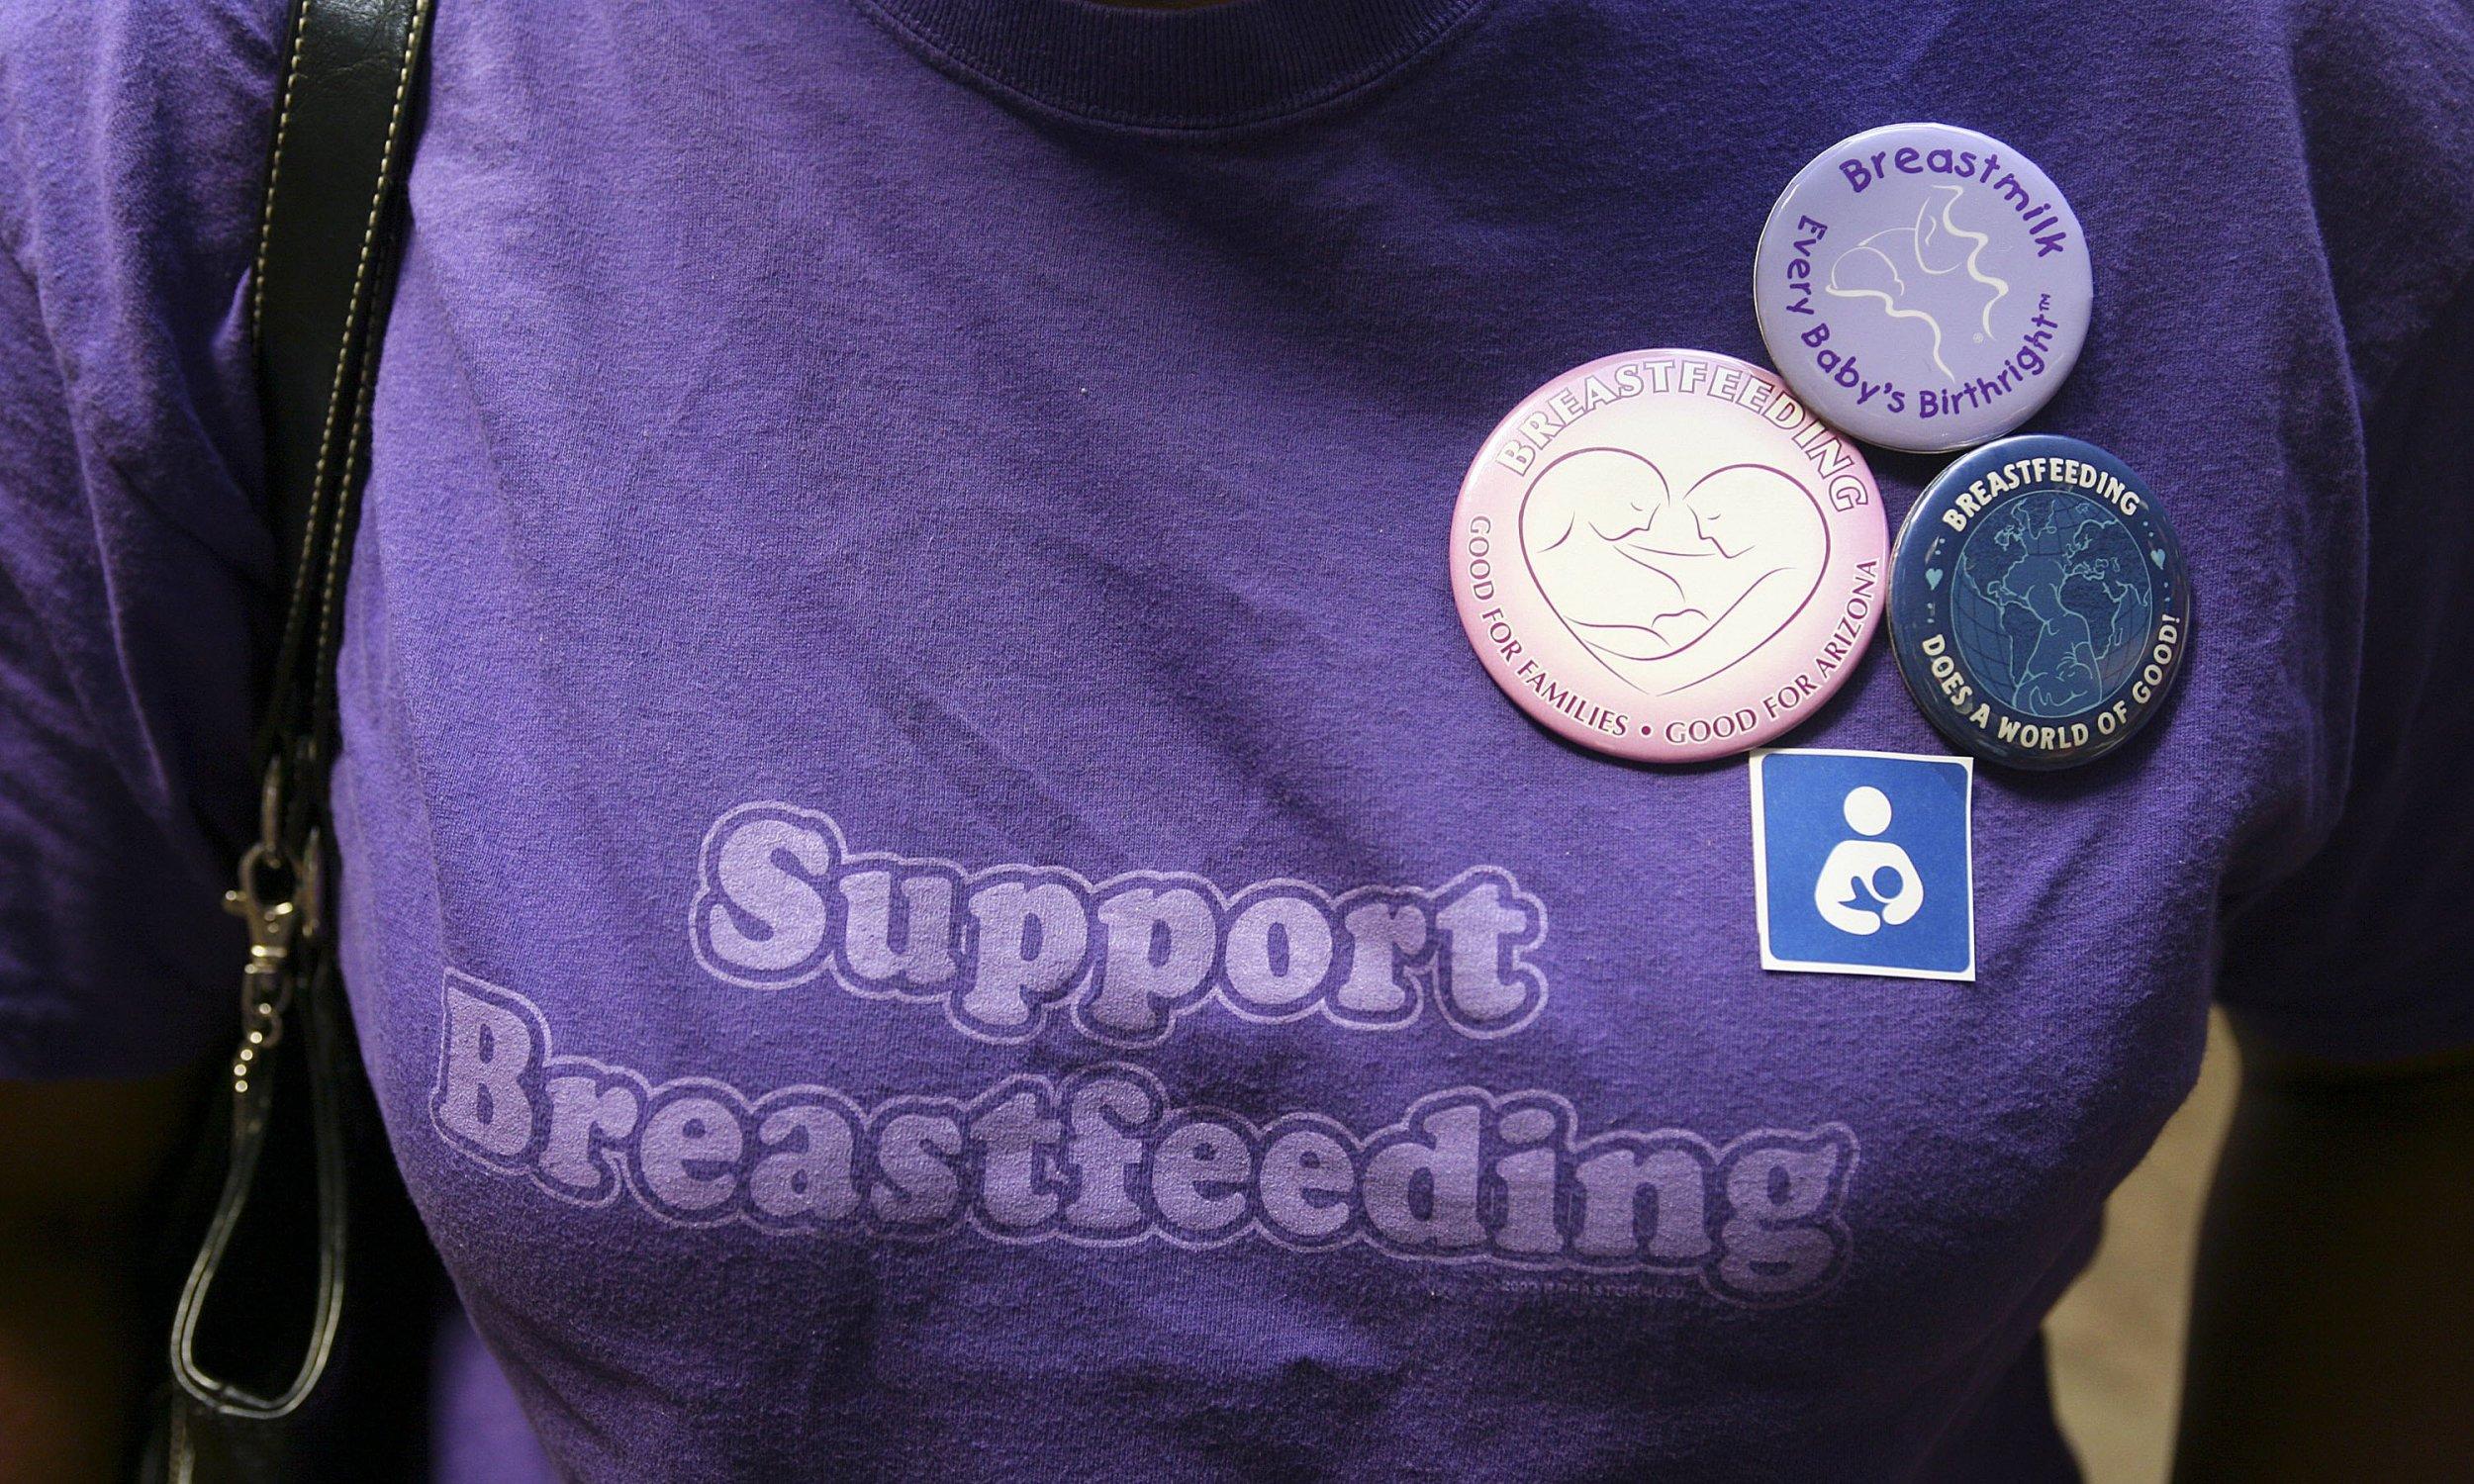 breastfeeding lawsuit texas roadhouse